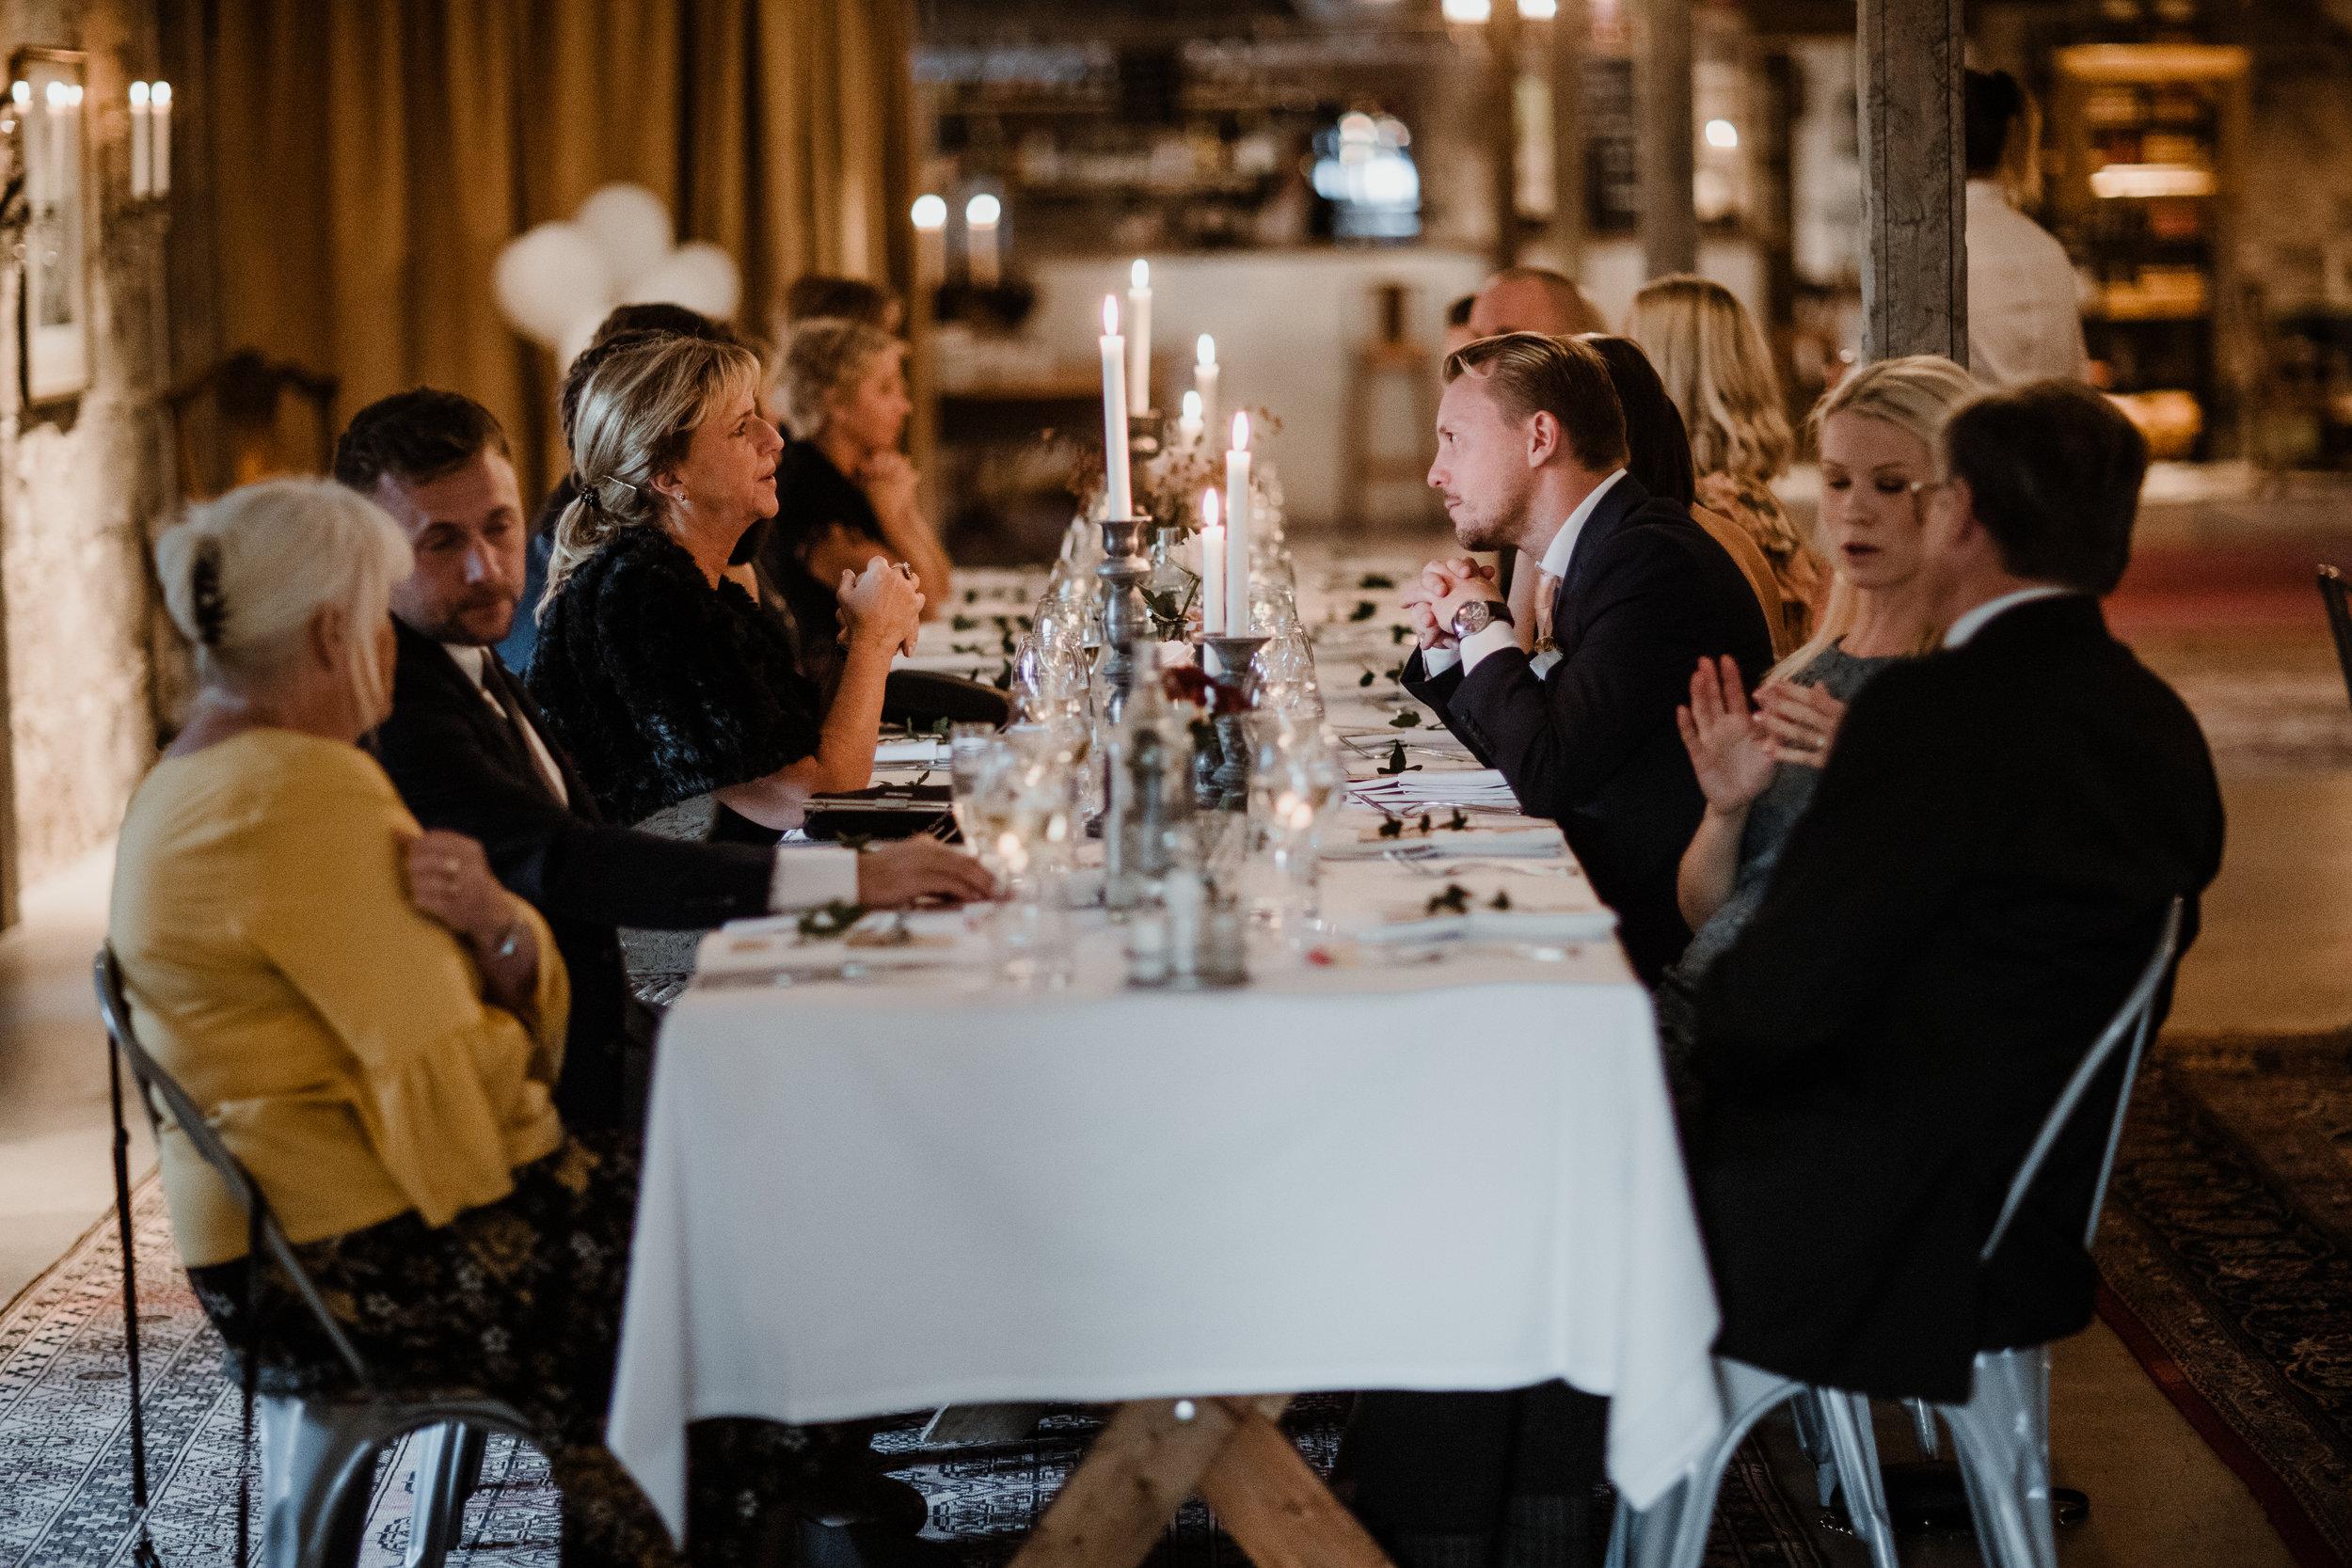 Bröllopsfotograf-Uddetorp Säteri-Höstbröllop-Fotograf Emilia- Bröllopsfotograf Borås-55.jpg